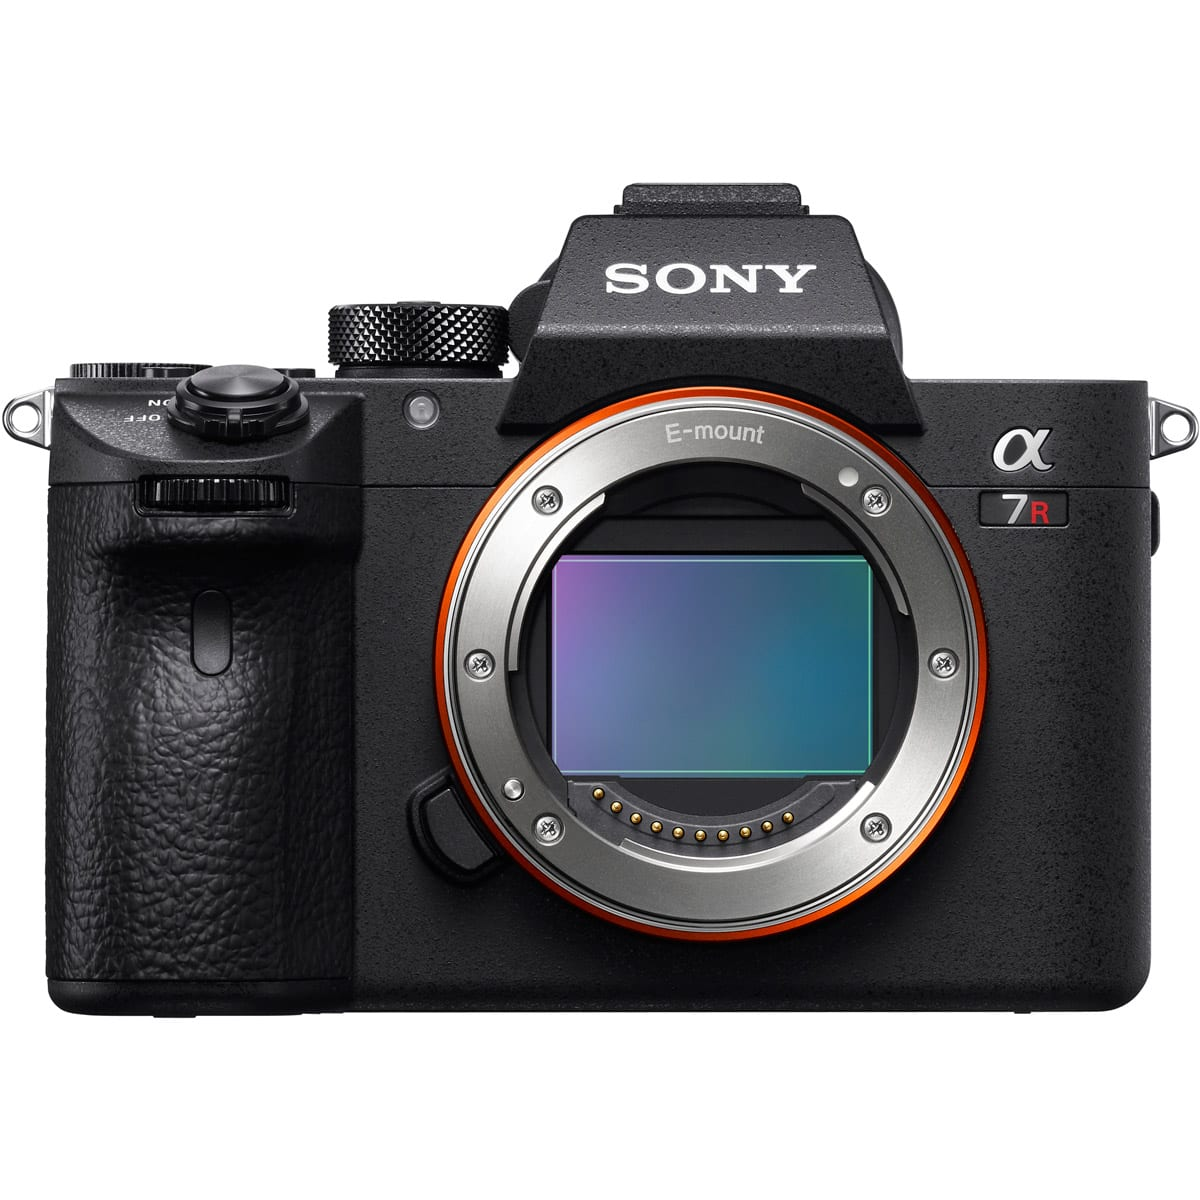 Sony EDU: Sony a7R IIIA Mirrorless Camera Body $2018, a7R IVA $2648, a7II $758 (less w/ SD cashback) + free s/h at Buydig